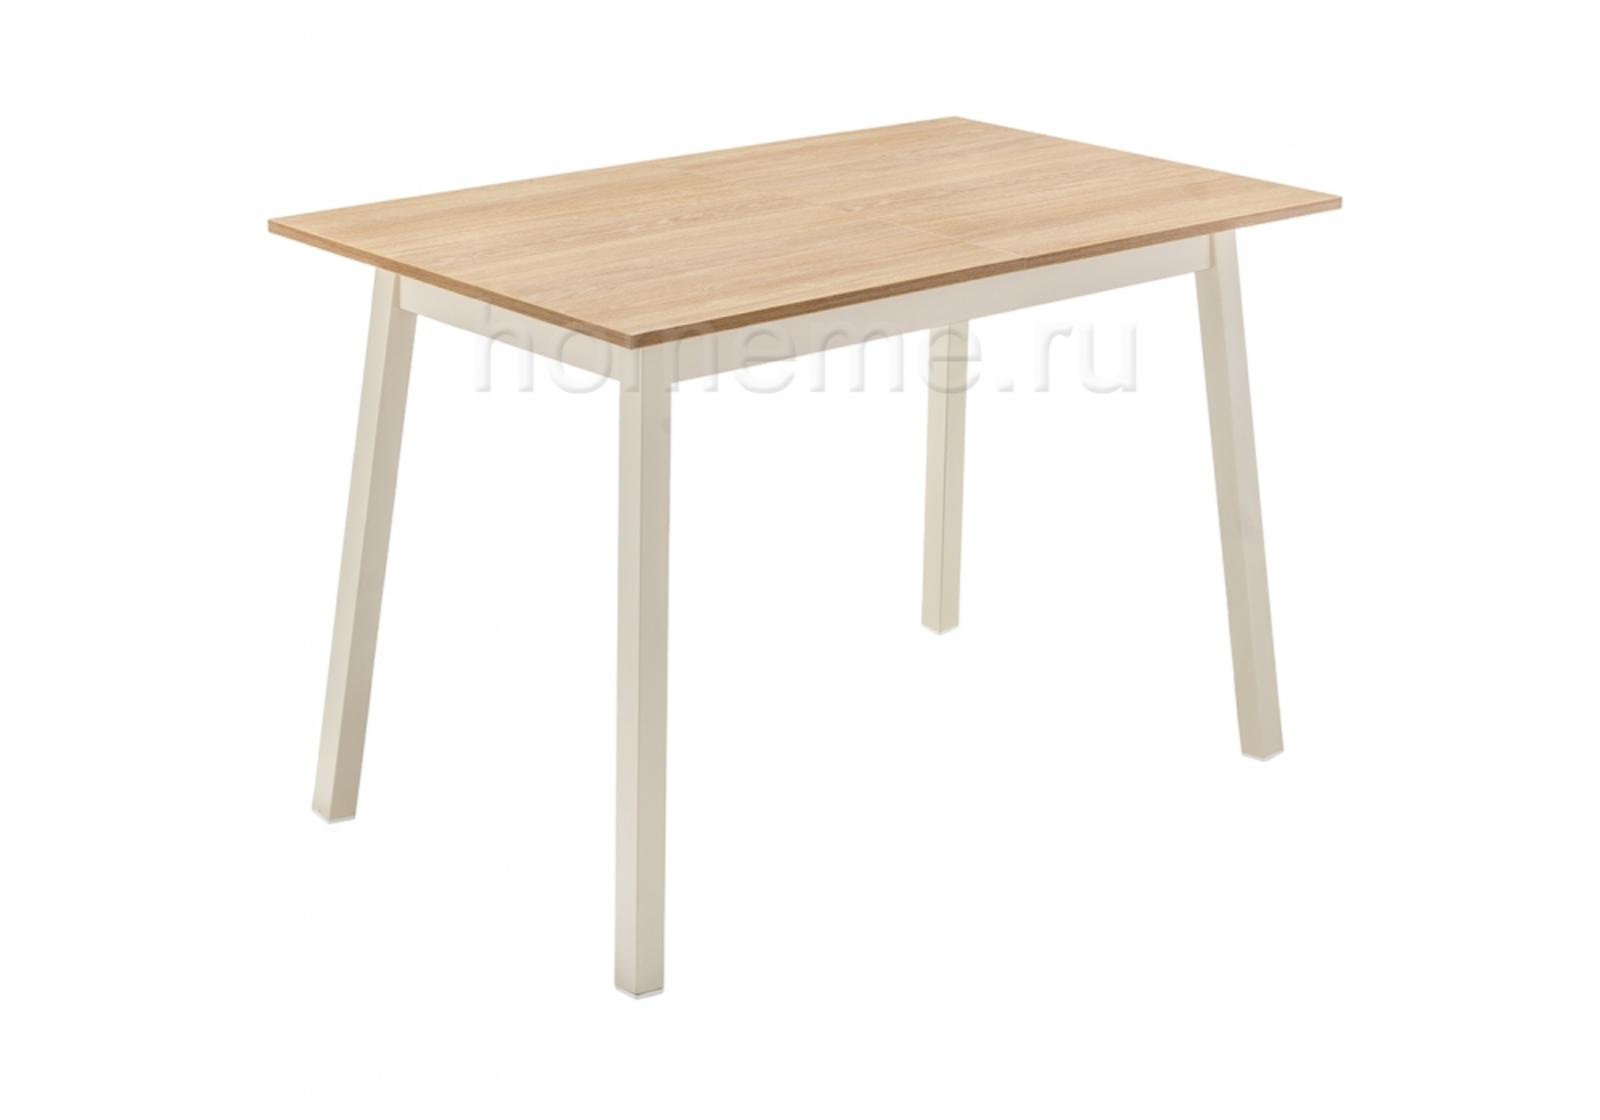 Кухонный стол HomeMe Ланс 110 дуб / кремовый 302728 от Homeme.ru